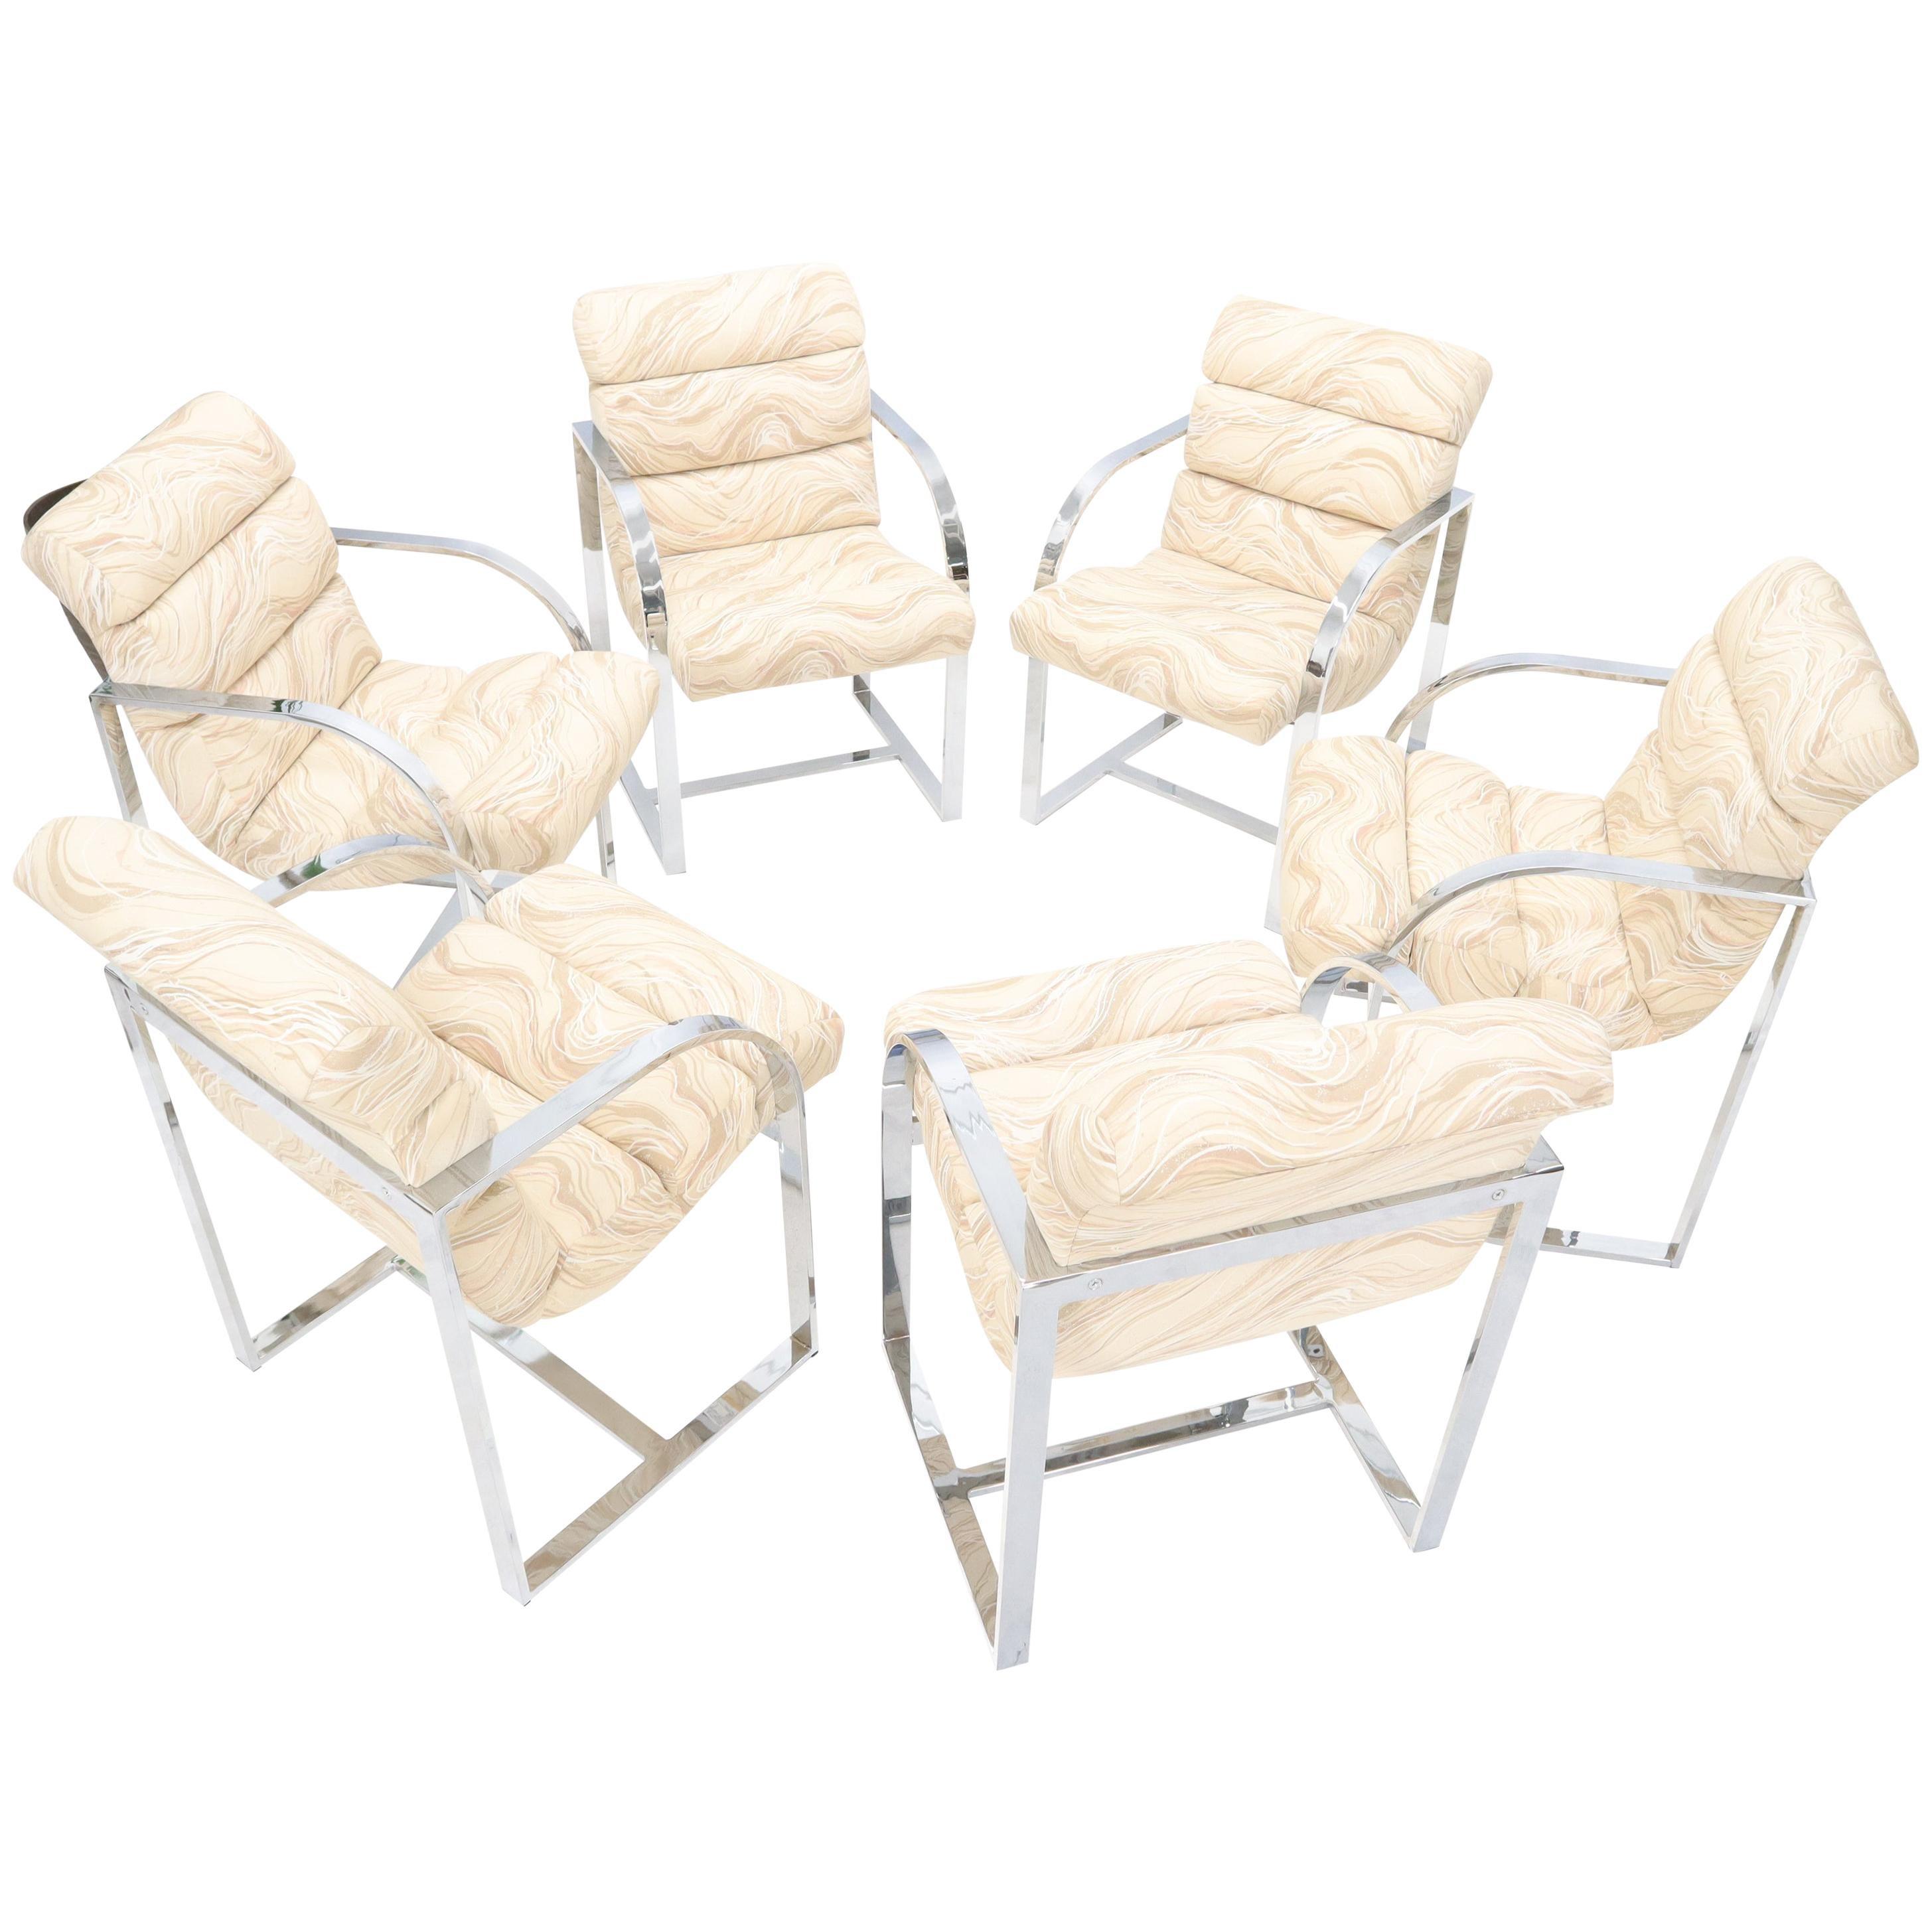 Set of 6 Scoop Shape Seats Chrome Dining Milo Baughman Room Chairs